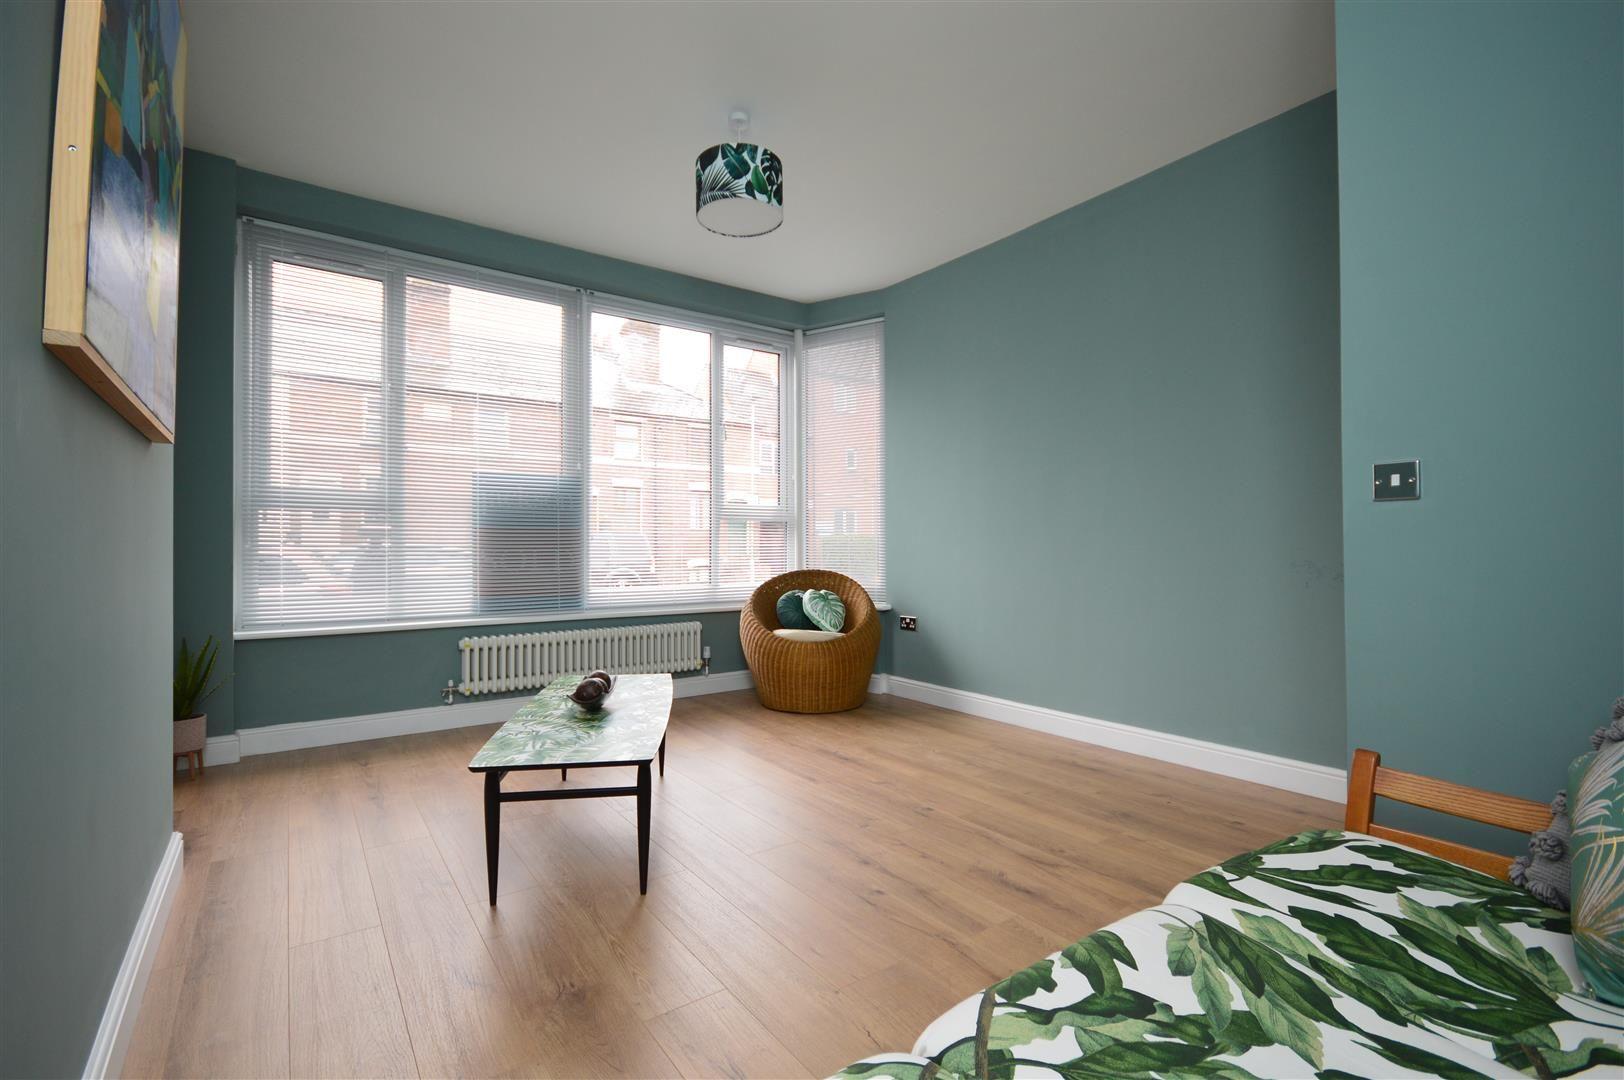 2 bed duplex for sale, HR1